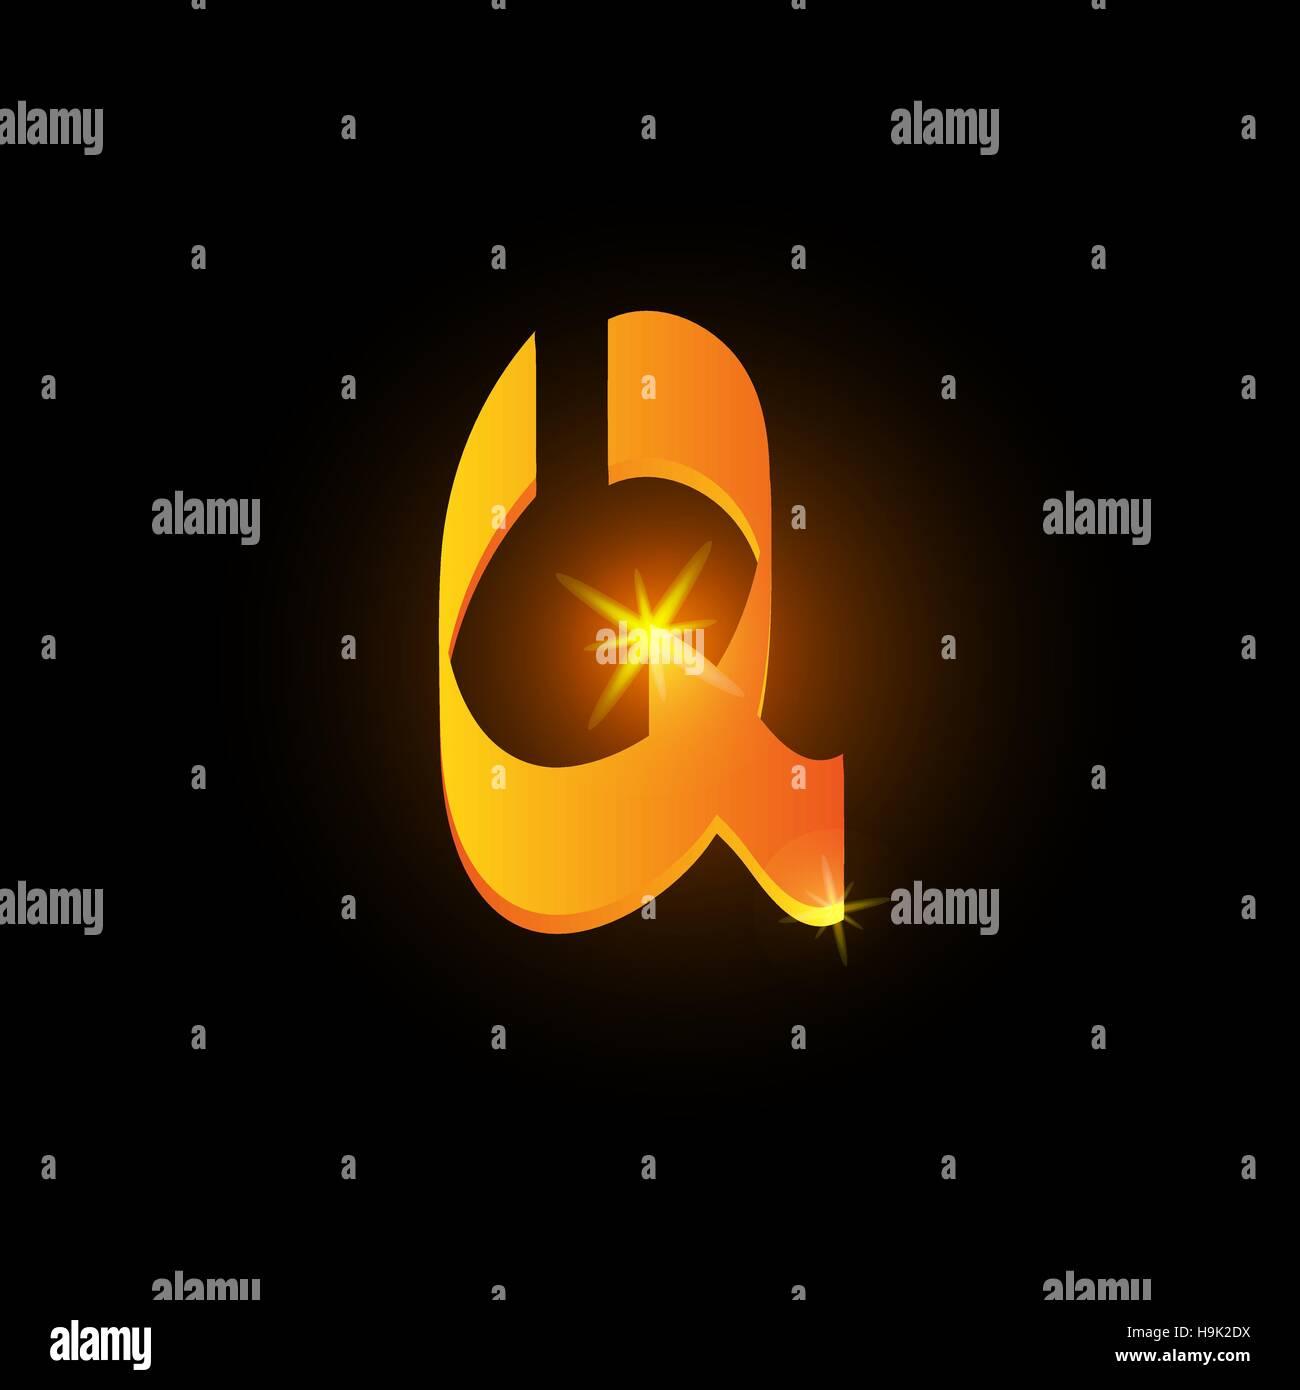 Golden arabic style letter q. Shiny latin alphabet element icon on black background. Oriental calligraphy design. - Stock Image